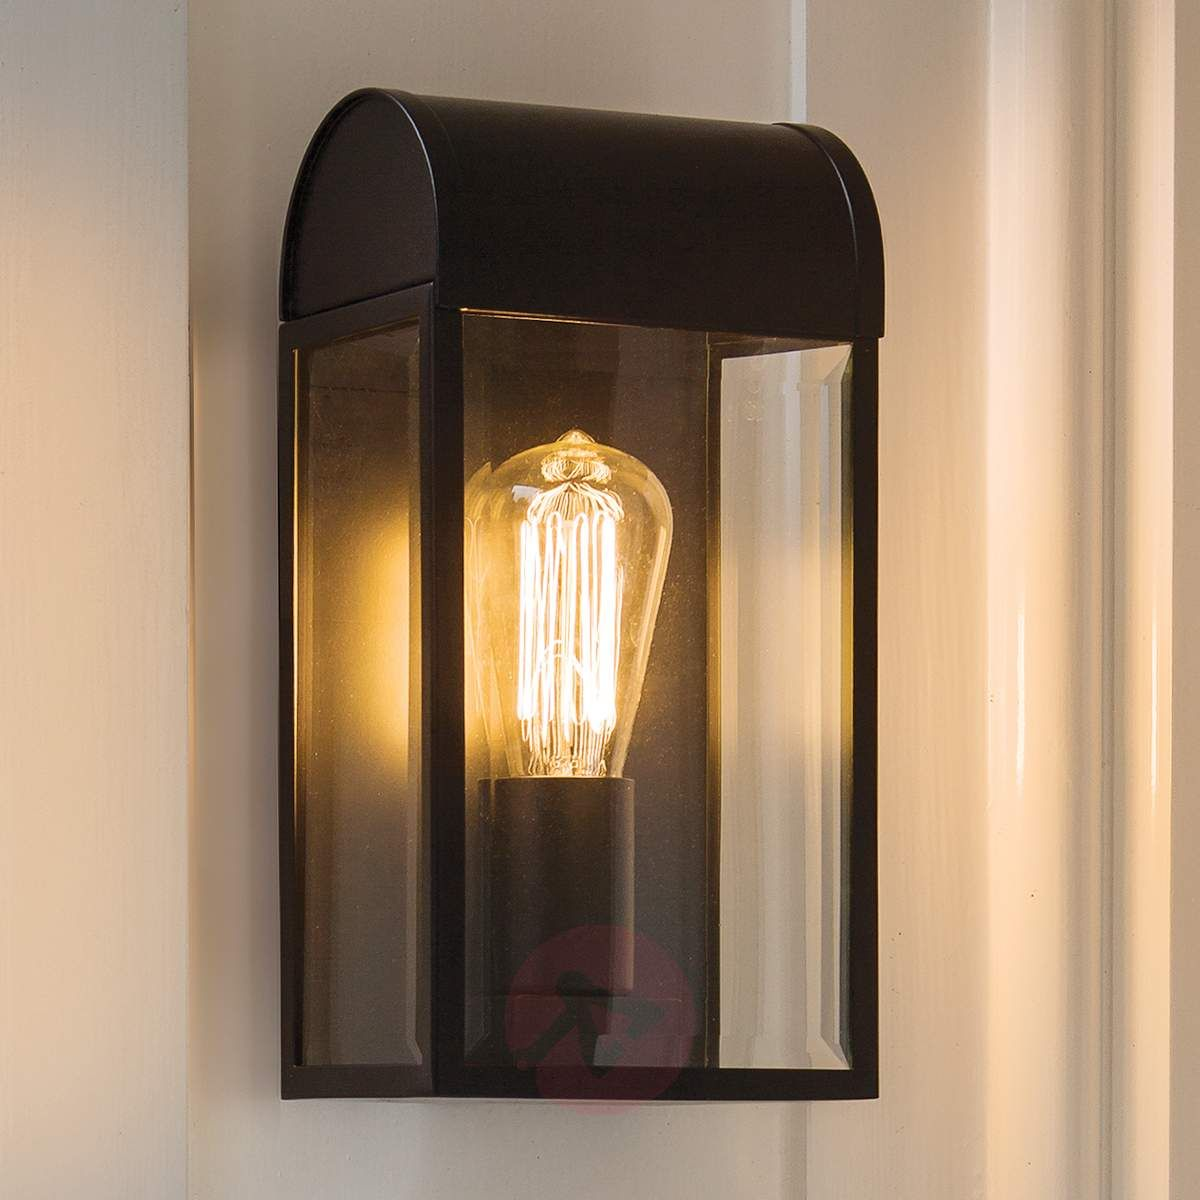 Zewnetrzna Lampa Scienna Newbury Lampy Lampa Scienna Lampa Ogrodowa